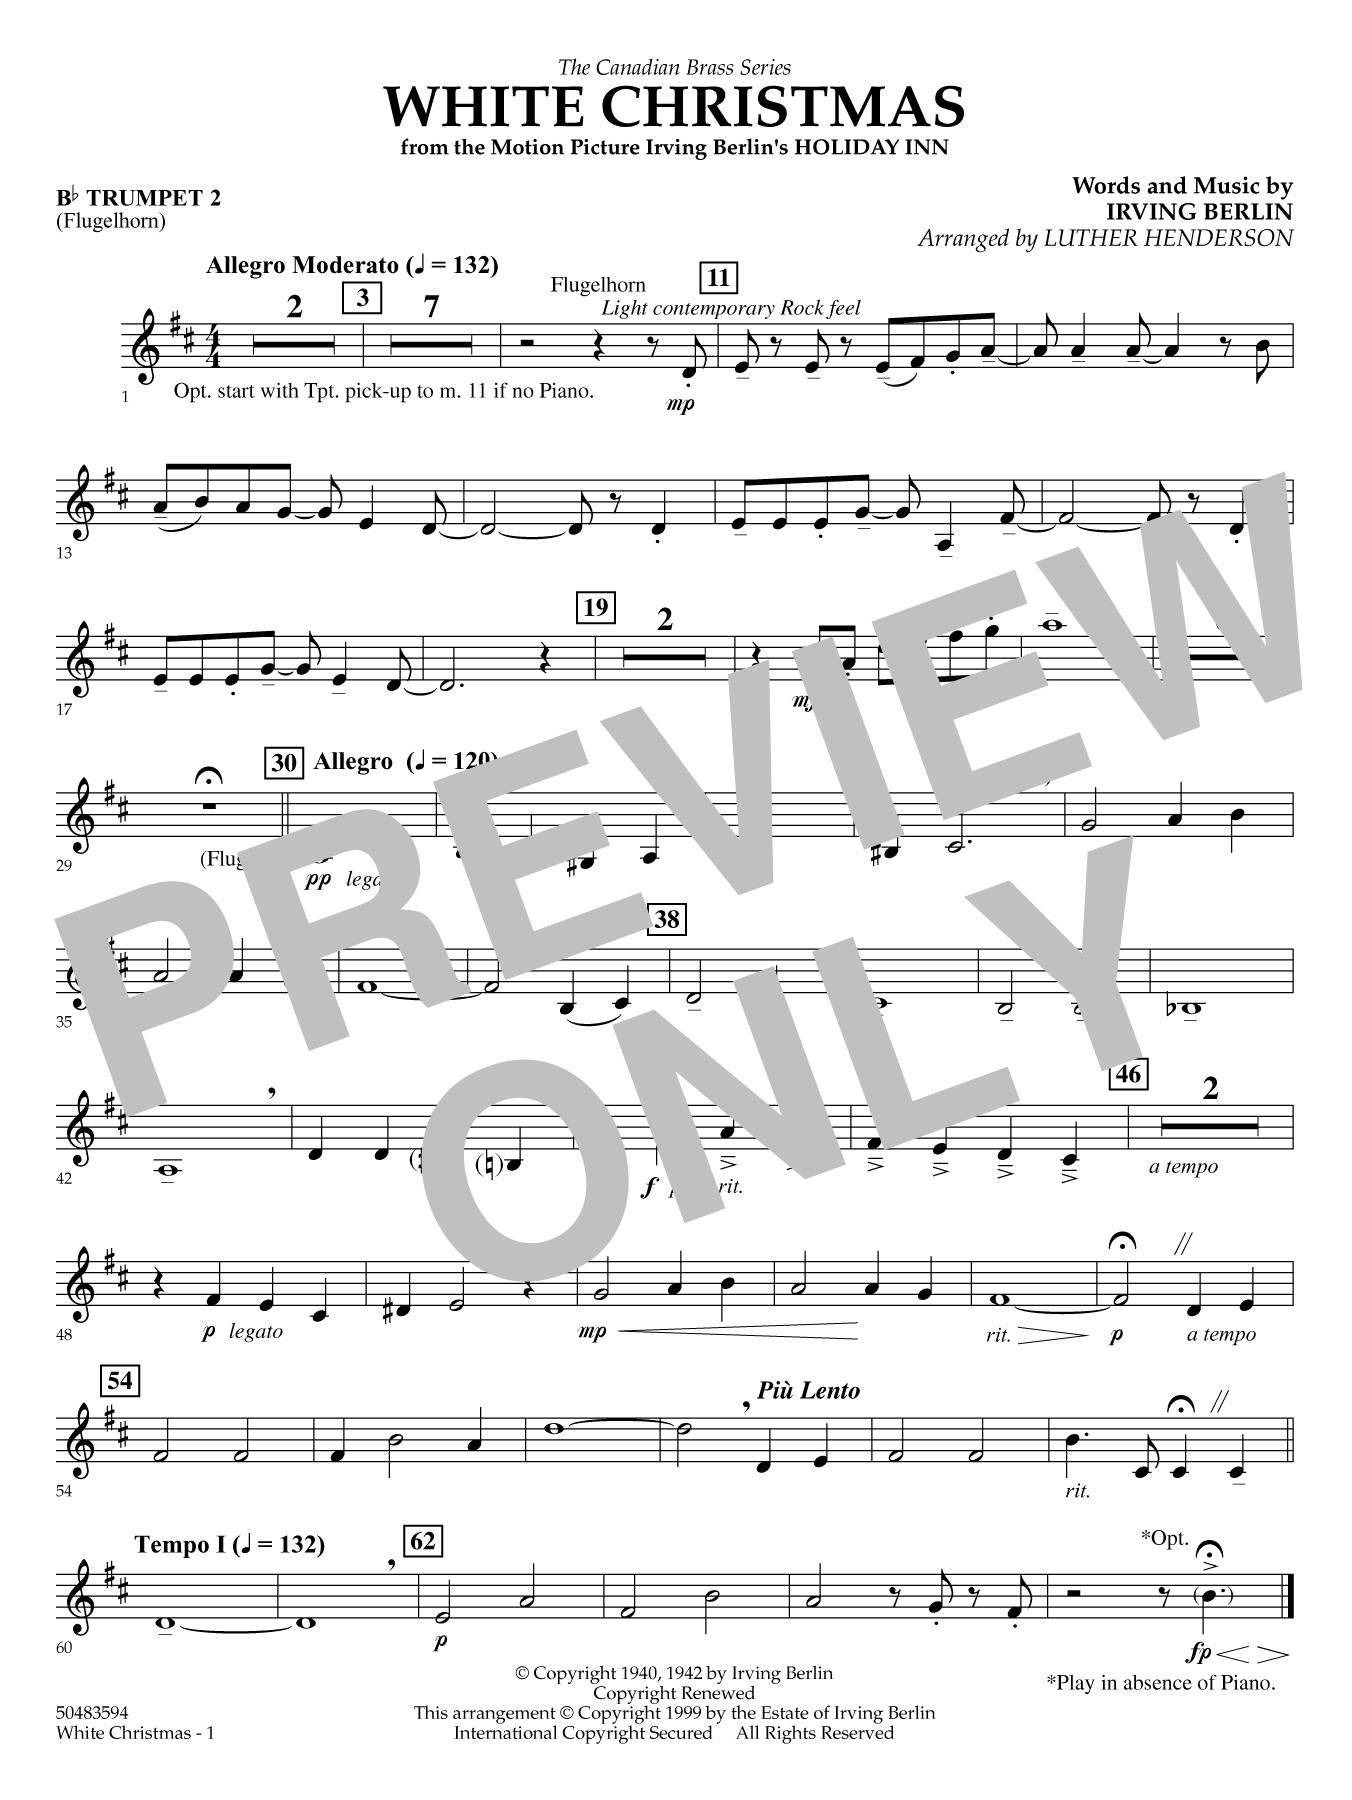 White Christmas - Trumpet 2 (opt. Flugelhorn) Sheet Music